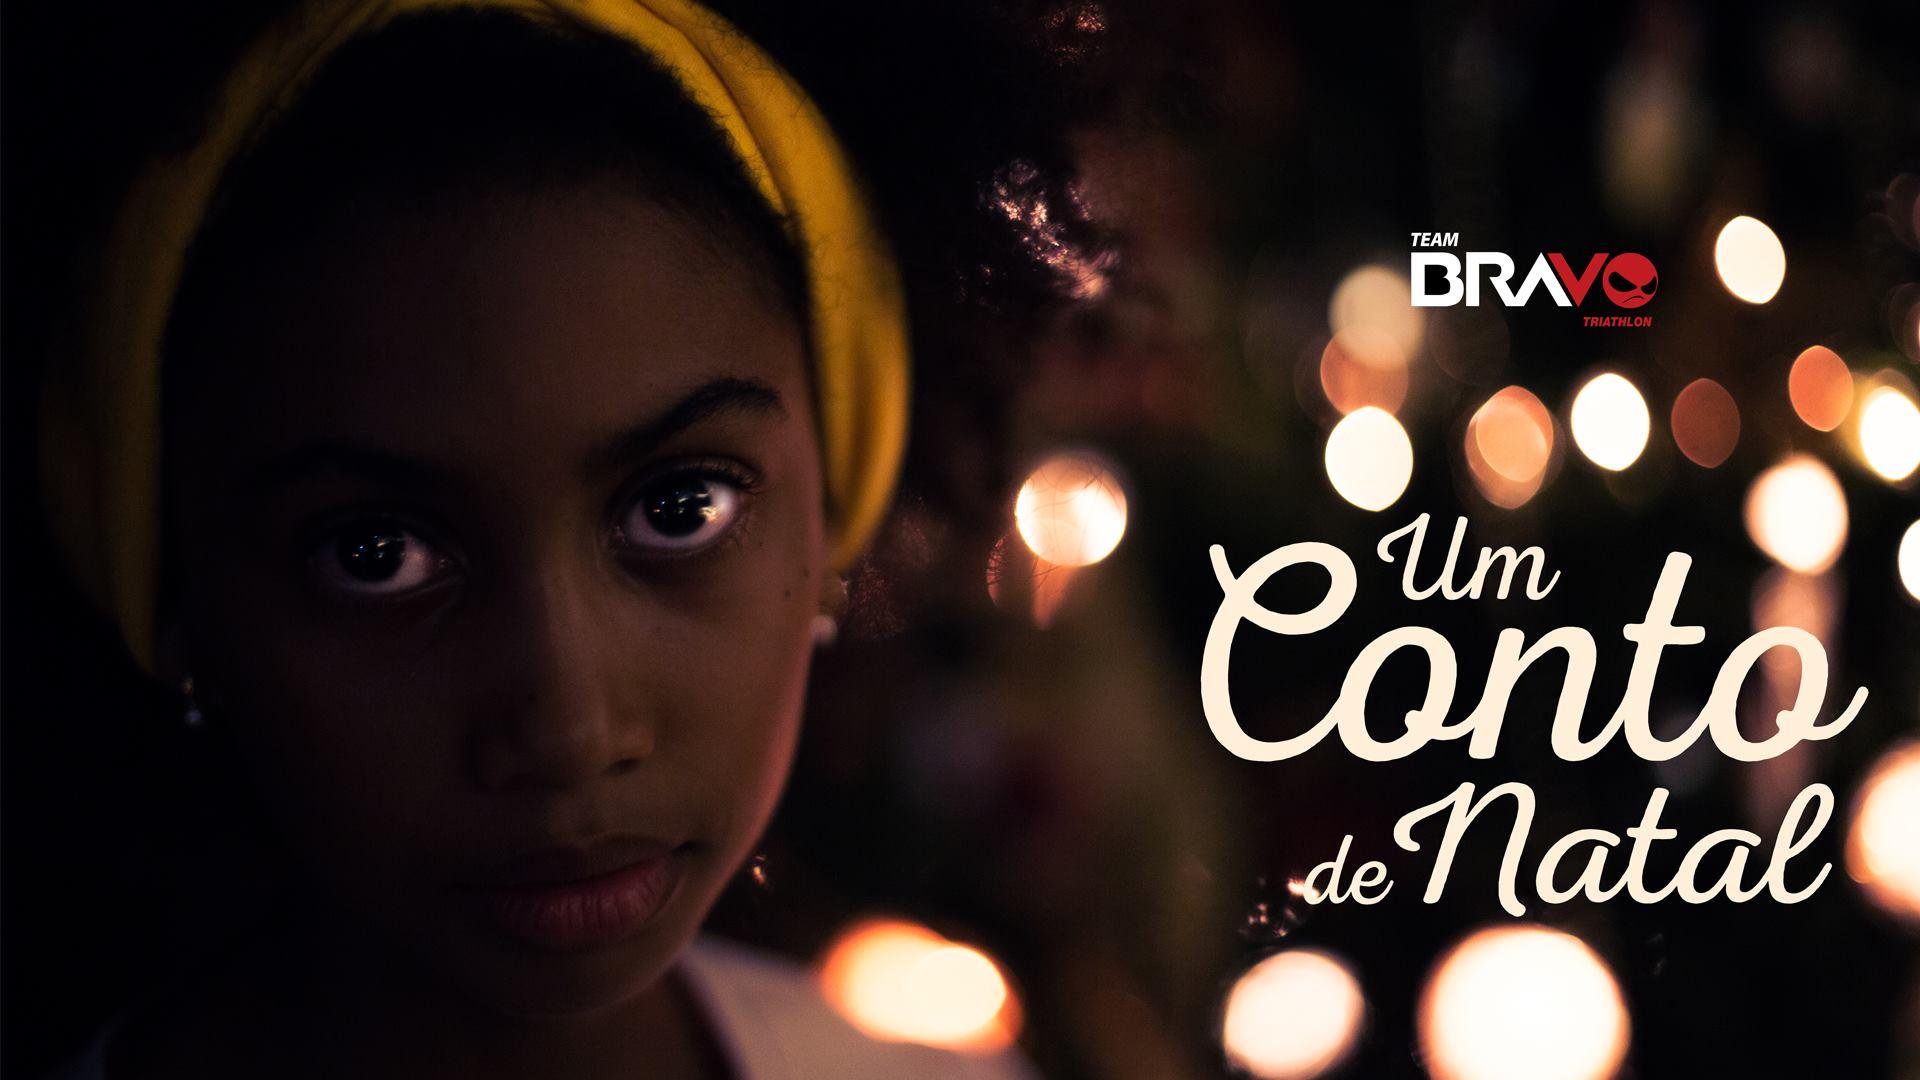 Team Bravo Coca-Cola : Feliz Natal !